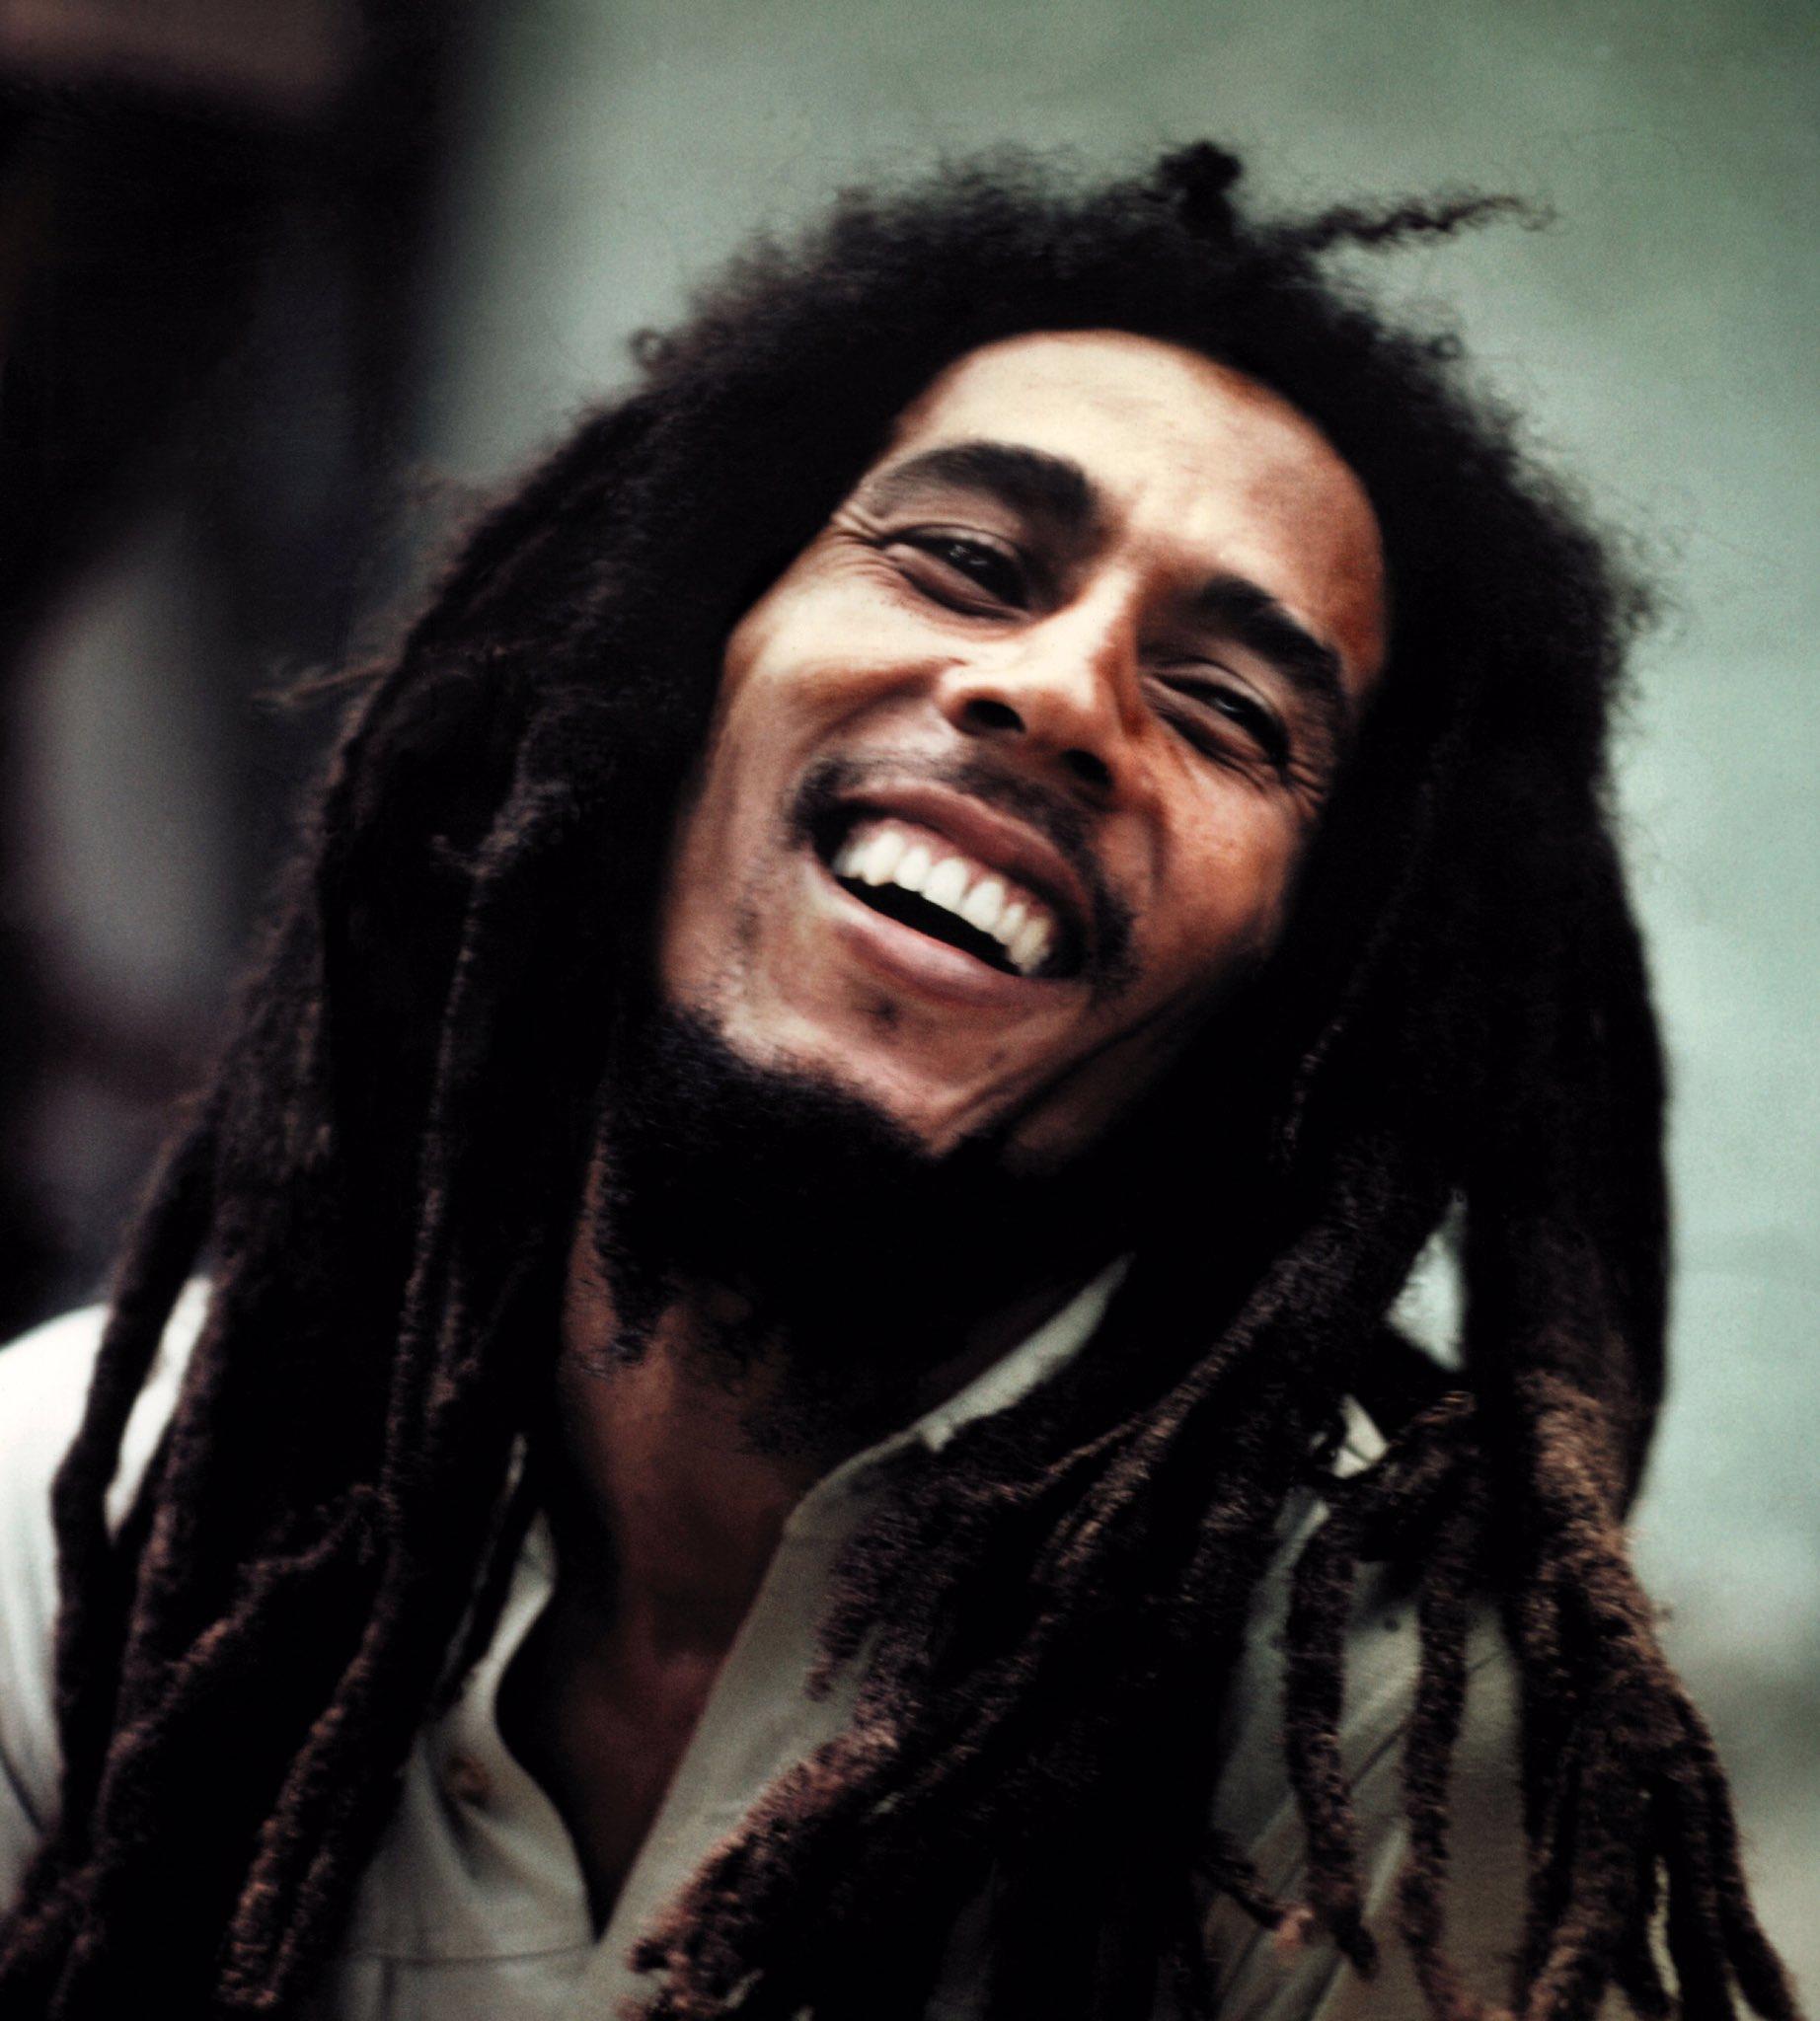 Happy birthday to the legend Bob Marley